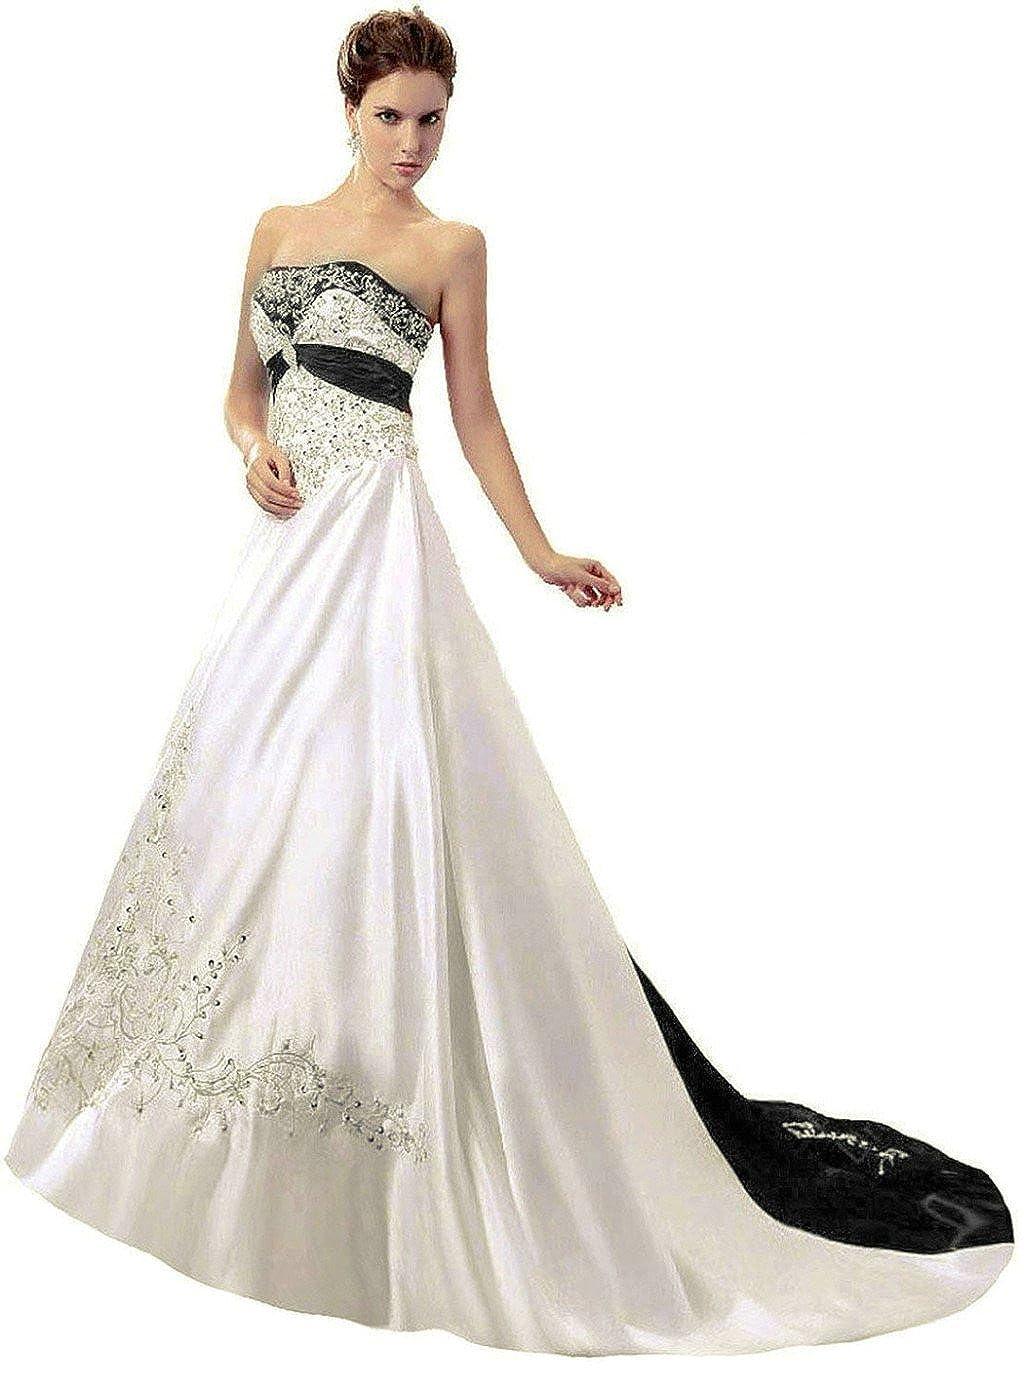 Ivory & Black Vantexi Women's Satin Embroidery Wedding Dress Bridal Gown